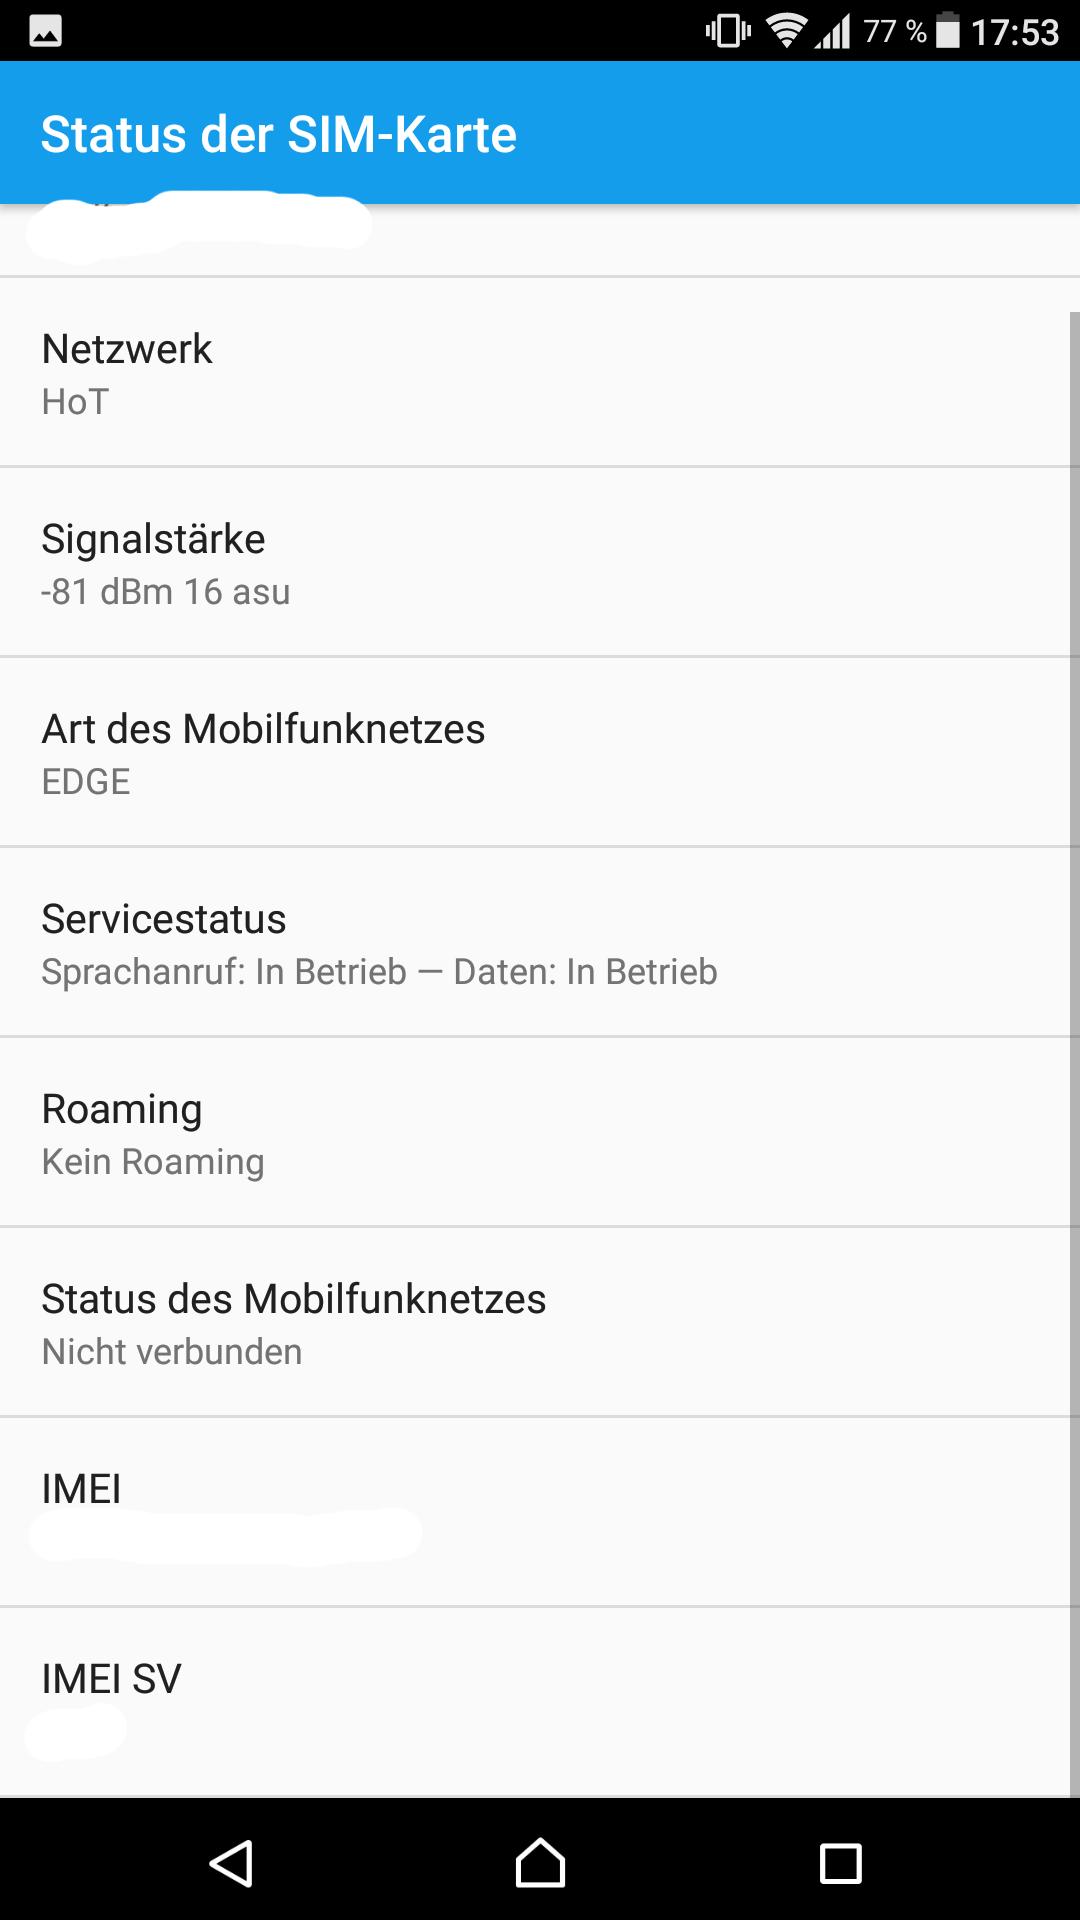 Suddenly almost always no signal with Xperia Z5 - Sony